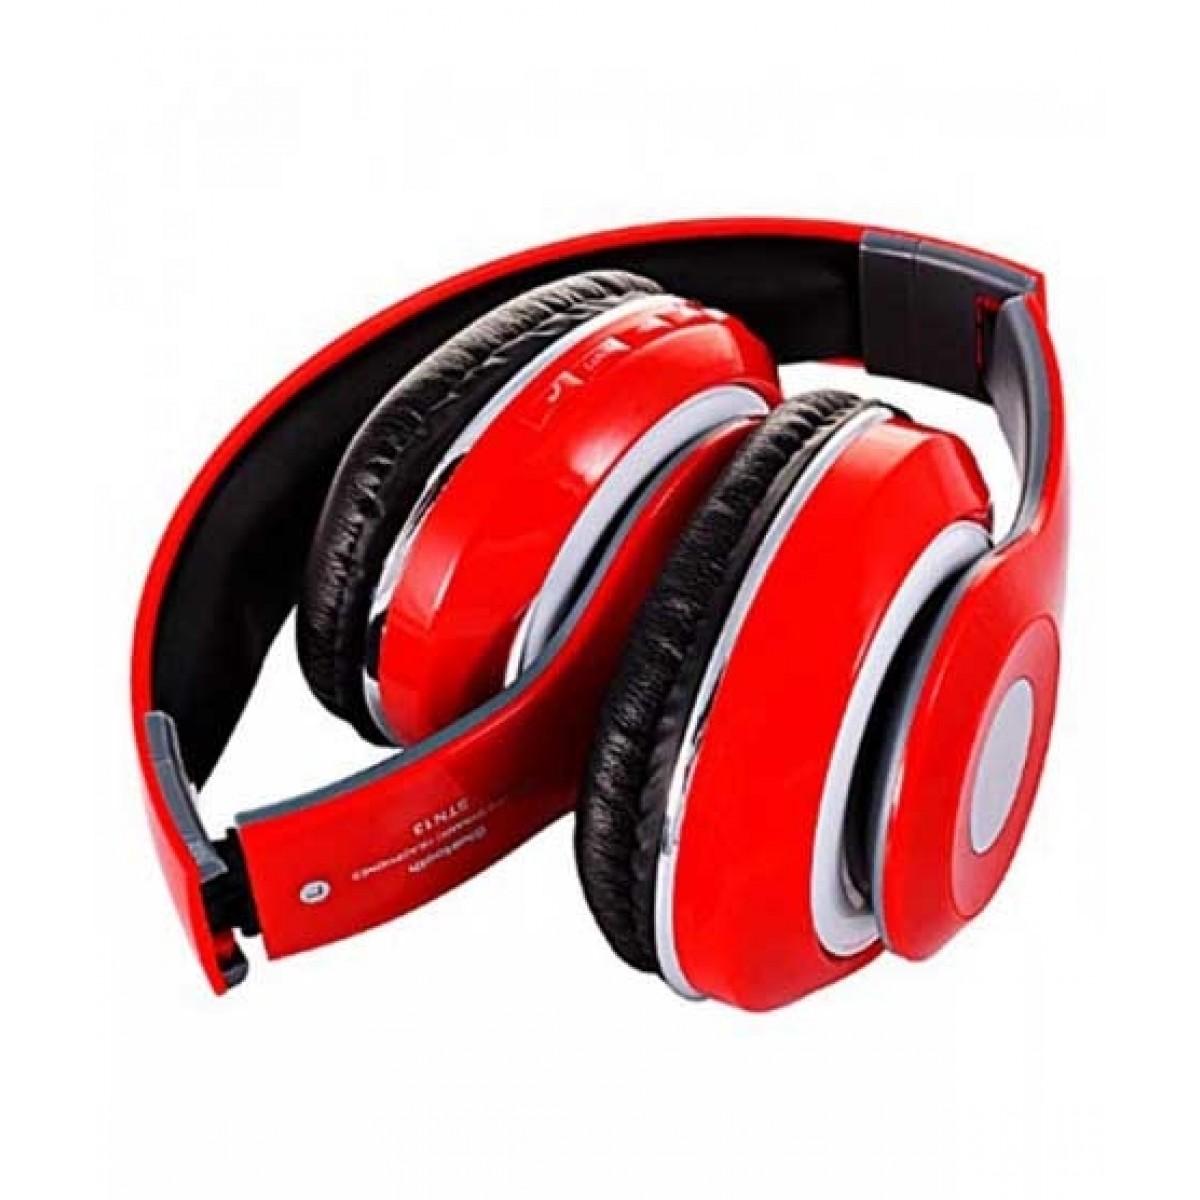 Wireless Bluetooth Headphones Red Price In Pakistan Buy Oro Store Bluetooth Headphones Red Stn 13 Ishopping Pk